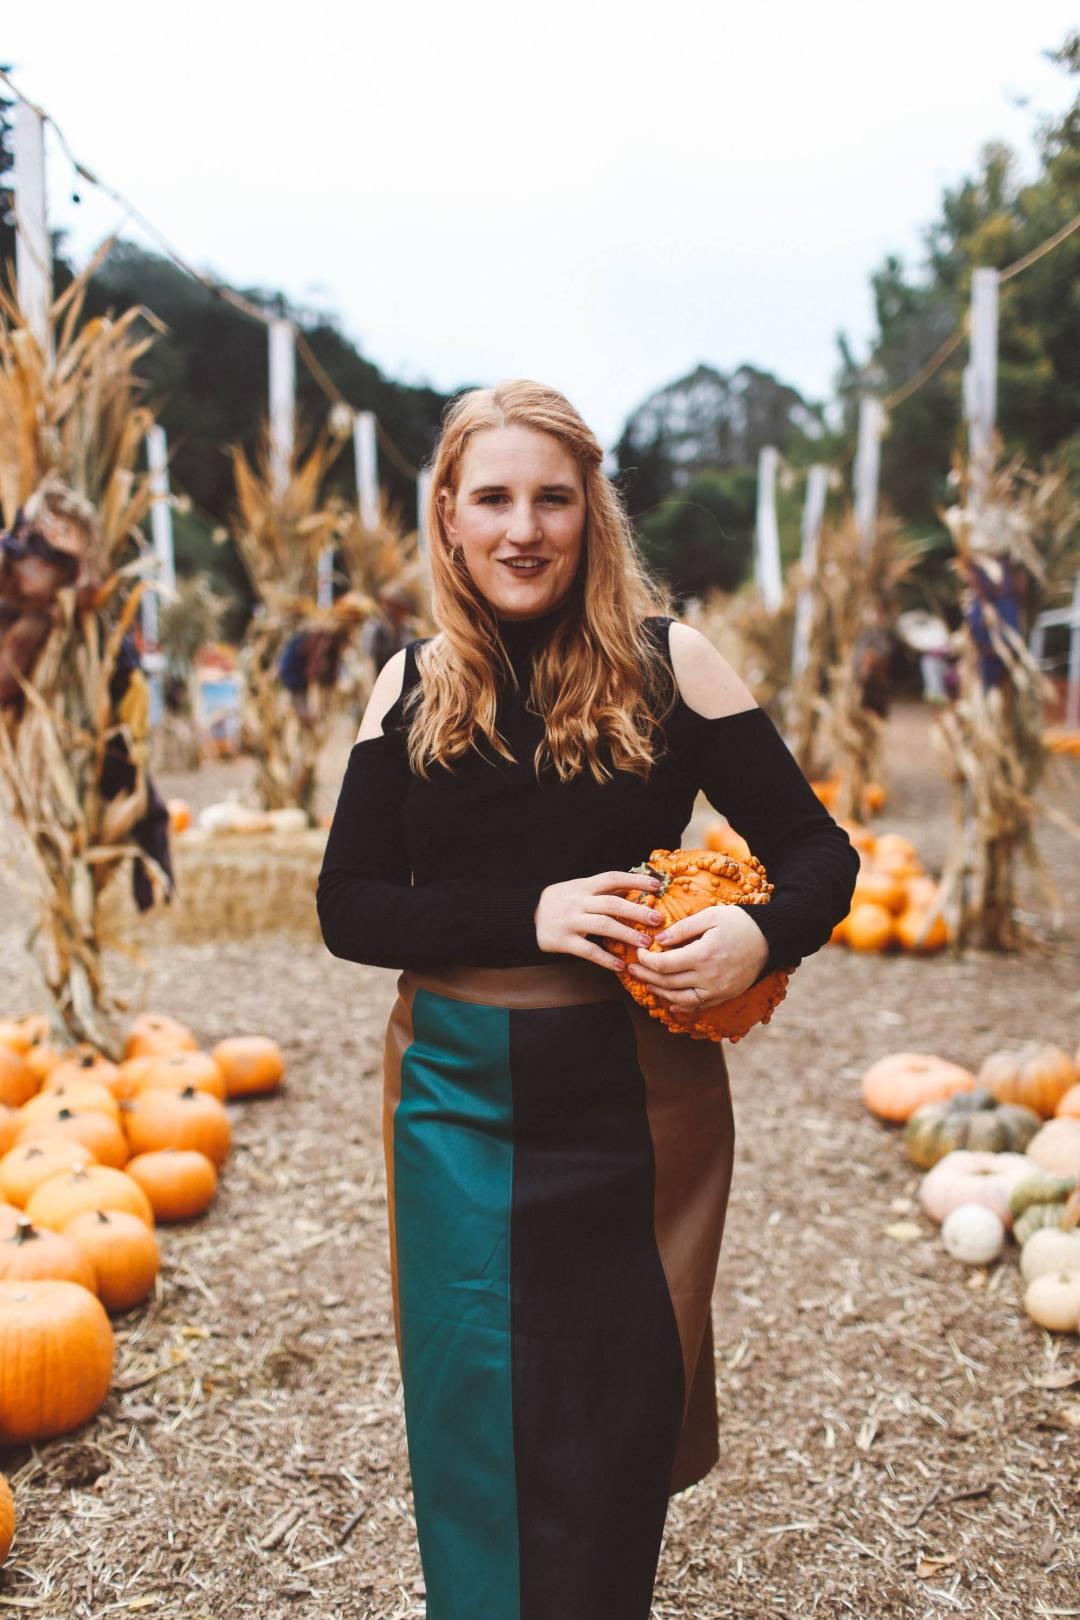 Panel skirt pumpkin patch woman san francisco